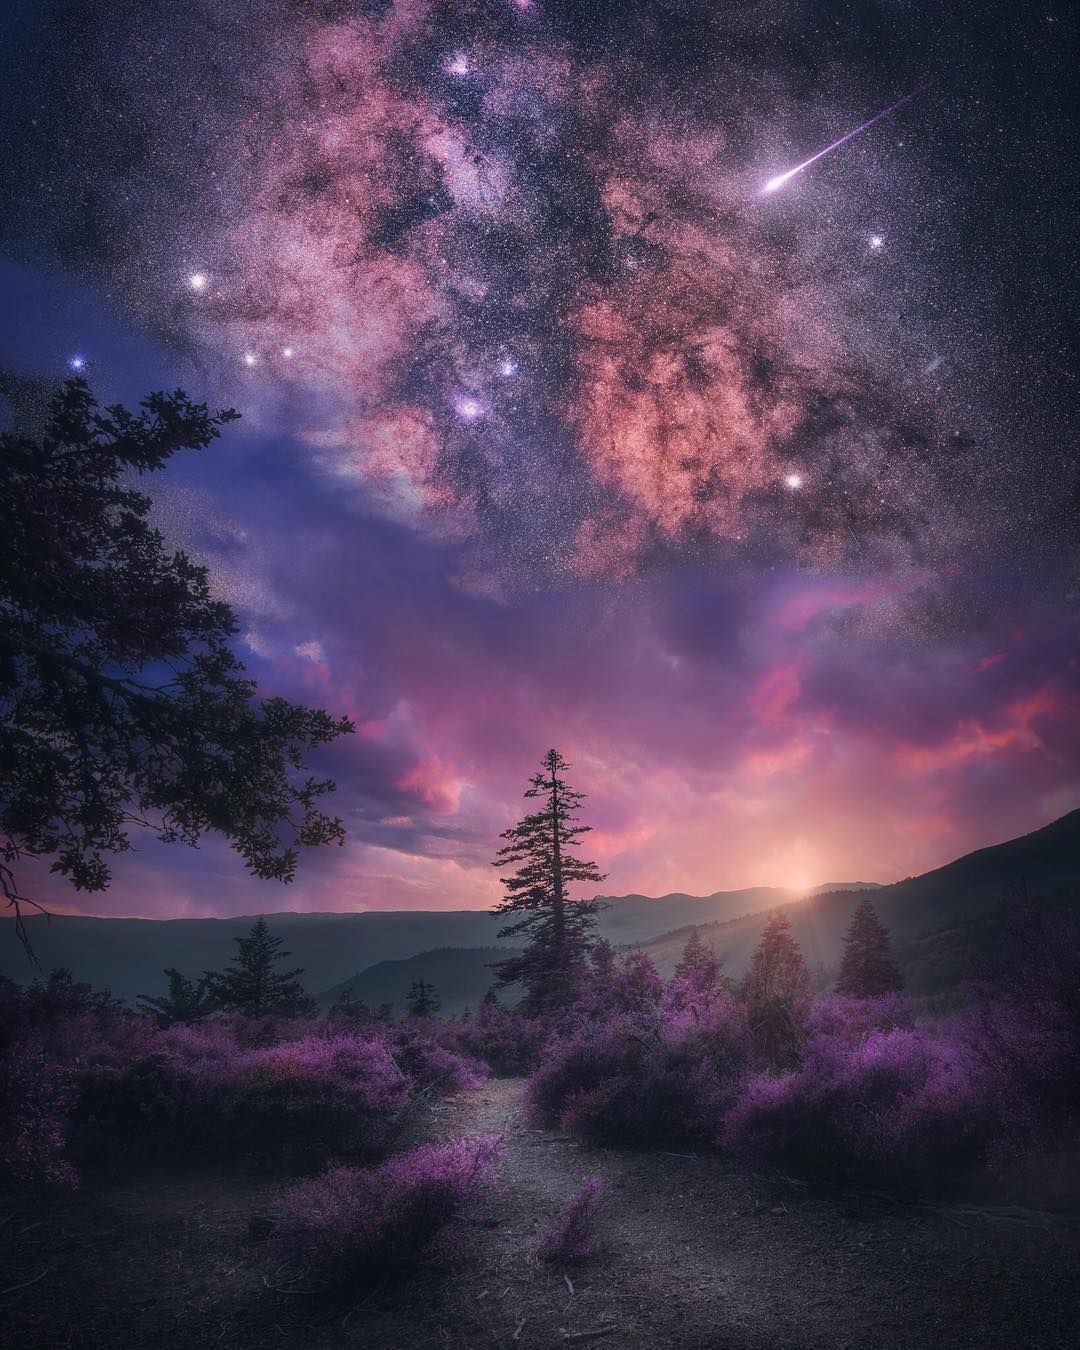 C O N G R A T U L A T I O N S Thelightninja You Own The Night Locatio Night Landscape Beautiful Nature Nature Photos